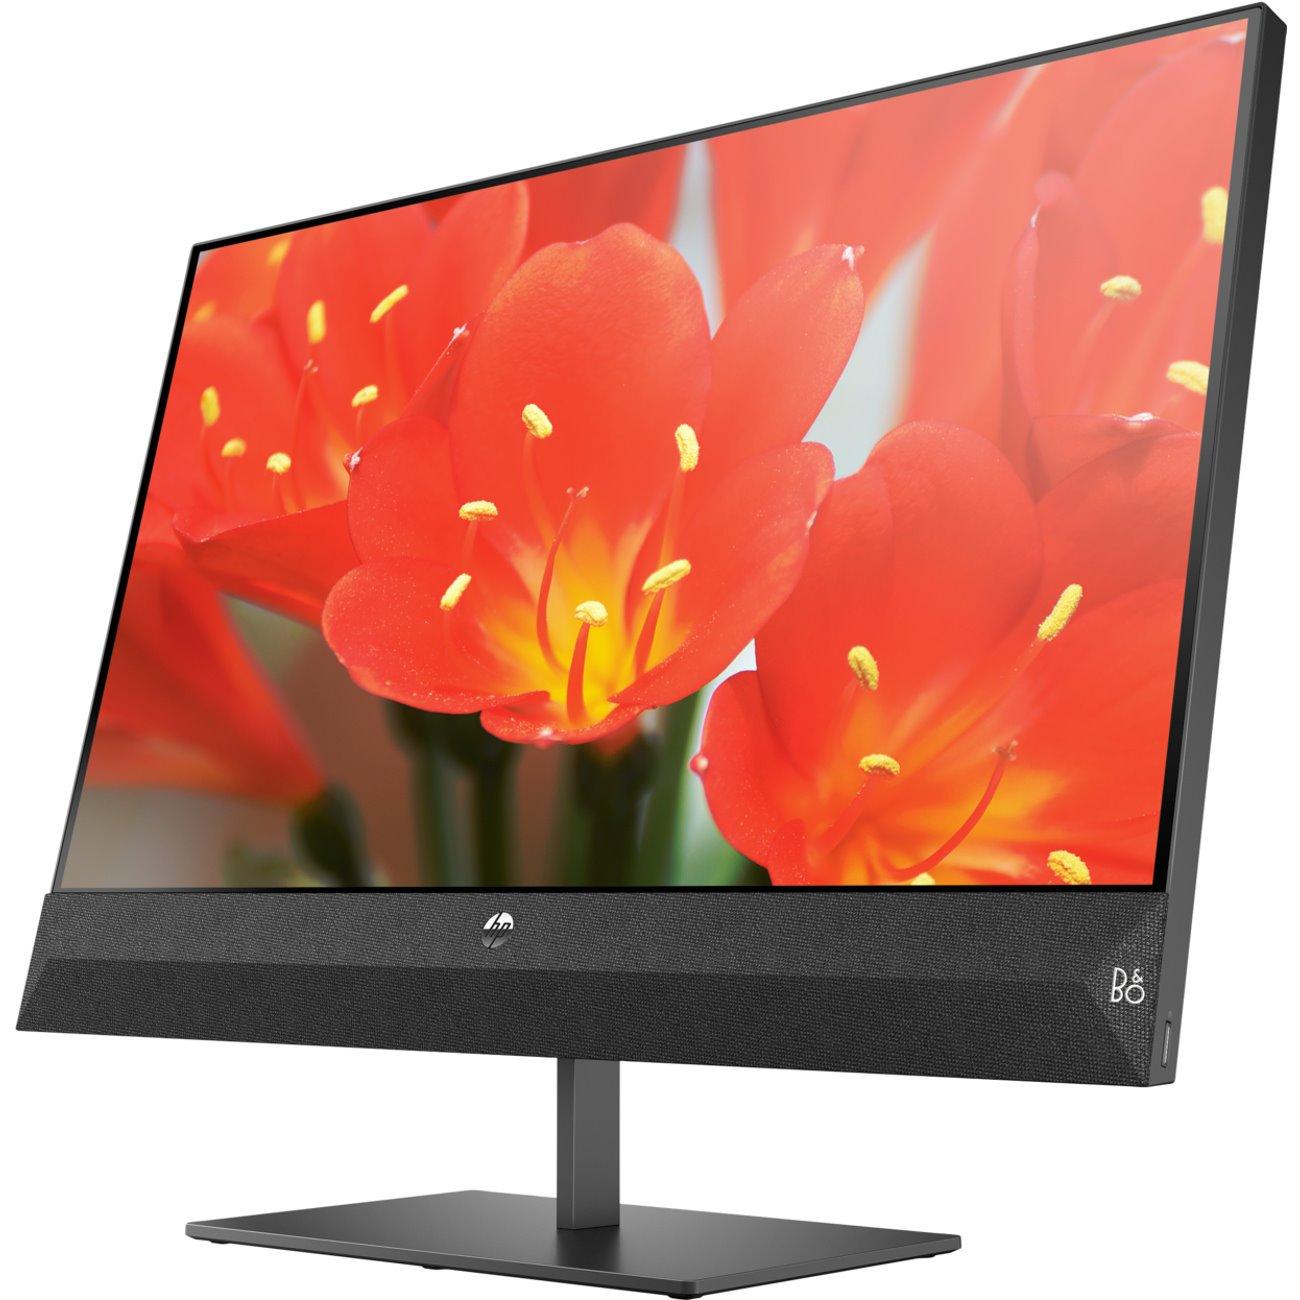 "HP Pavilion 27 68.6 cm (27"") Full HD LED Gaming LCD Monitor - 16:9 - Sparkling Black"